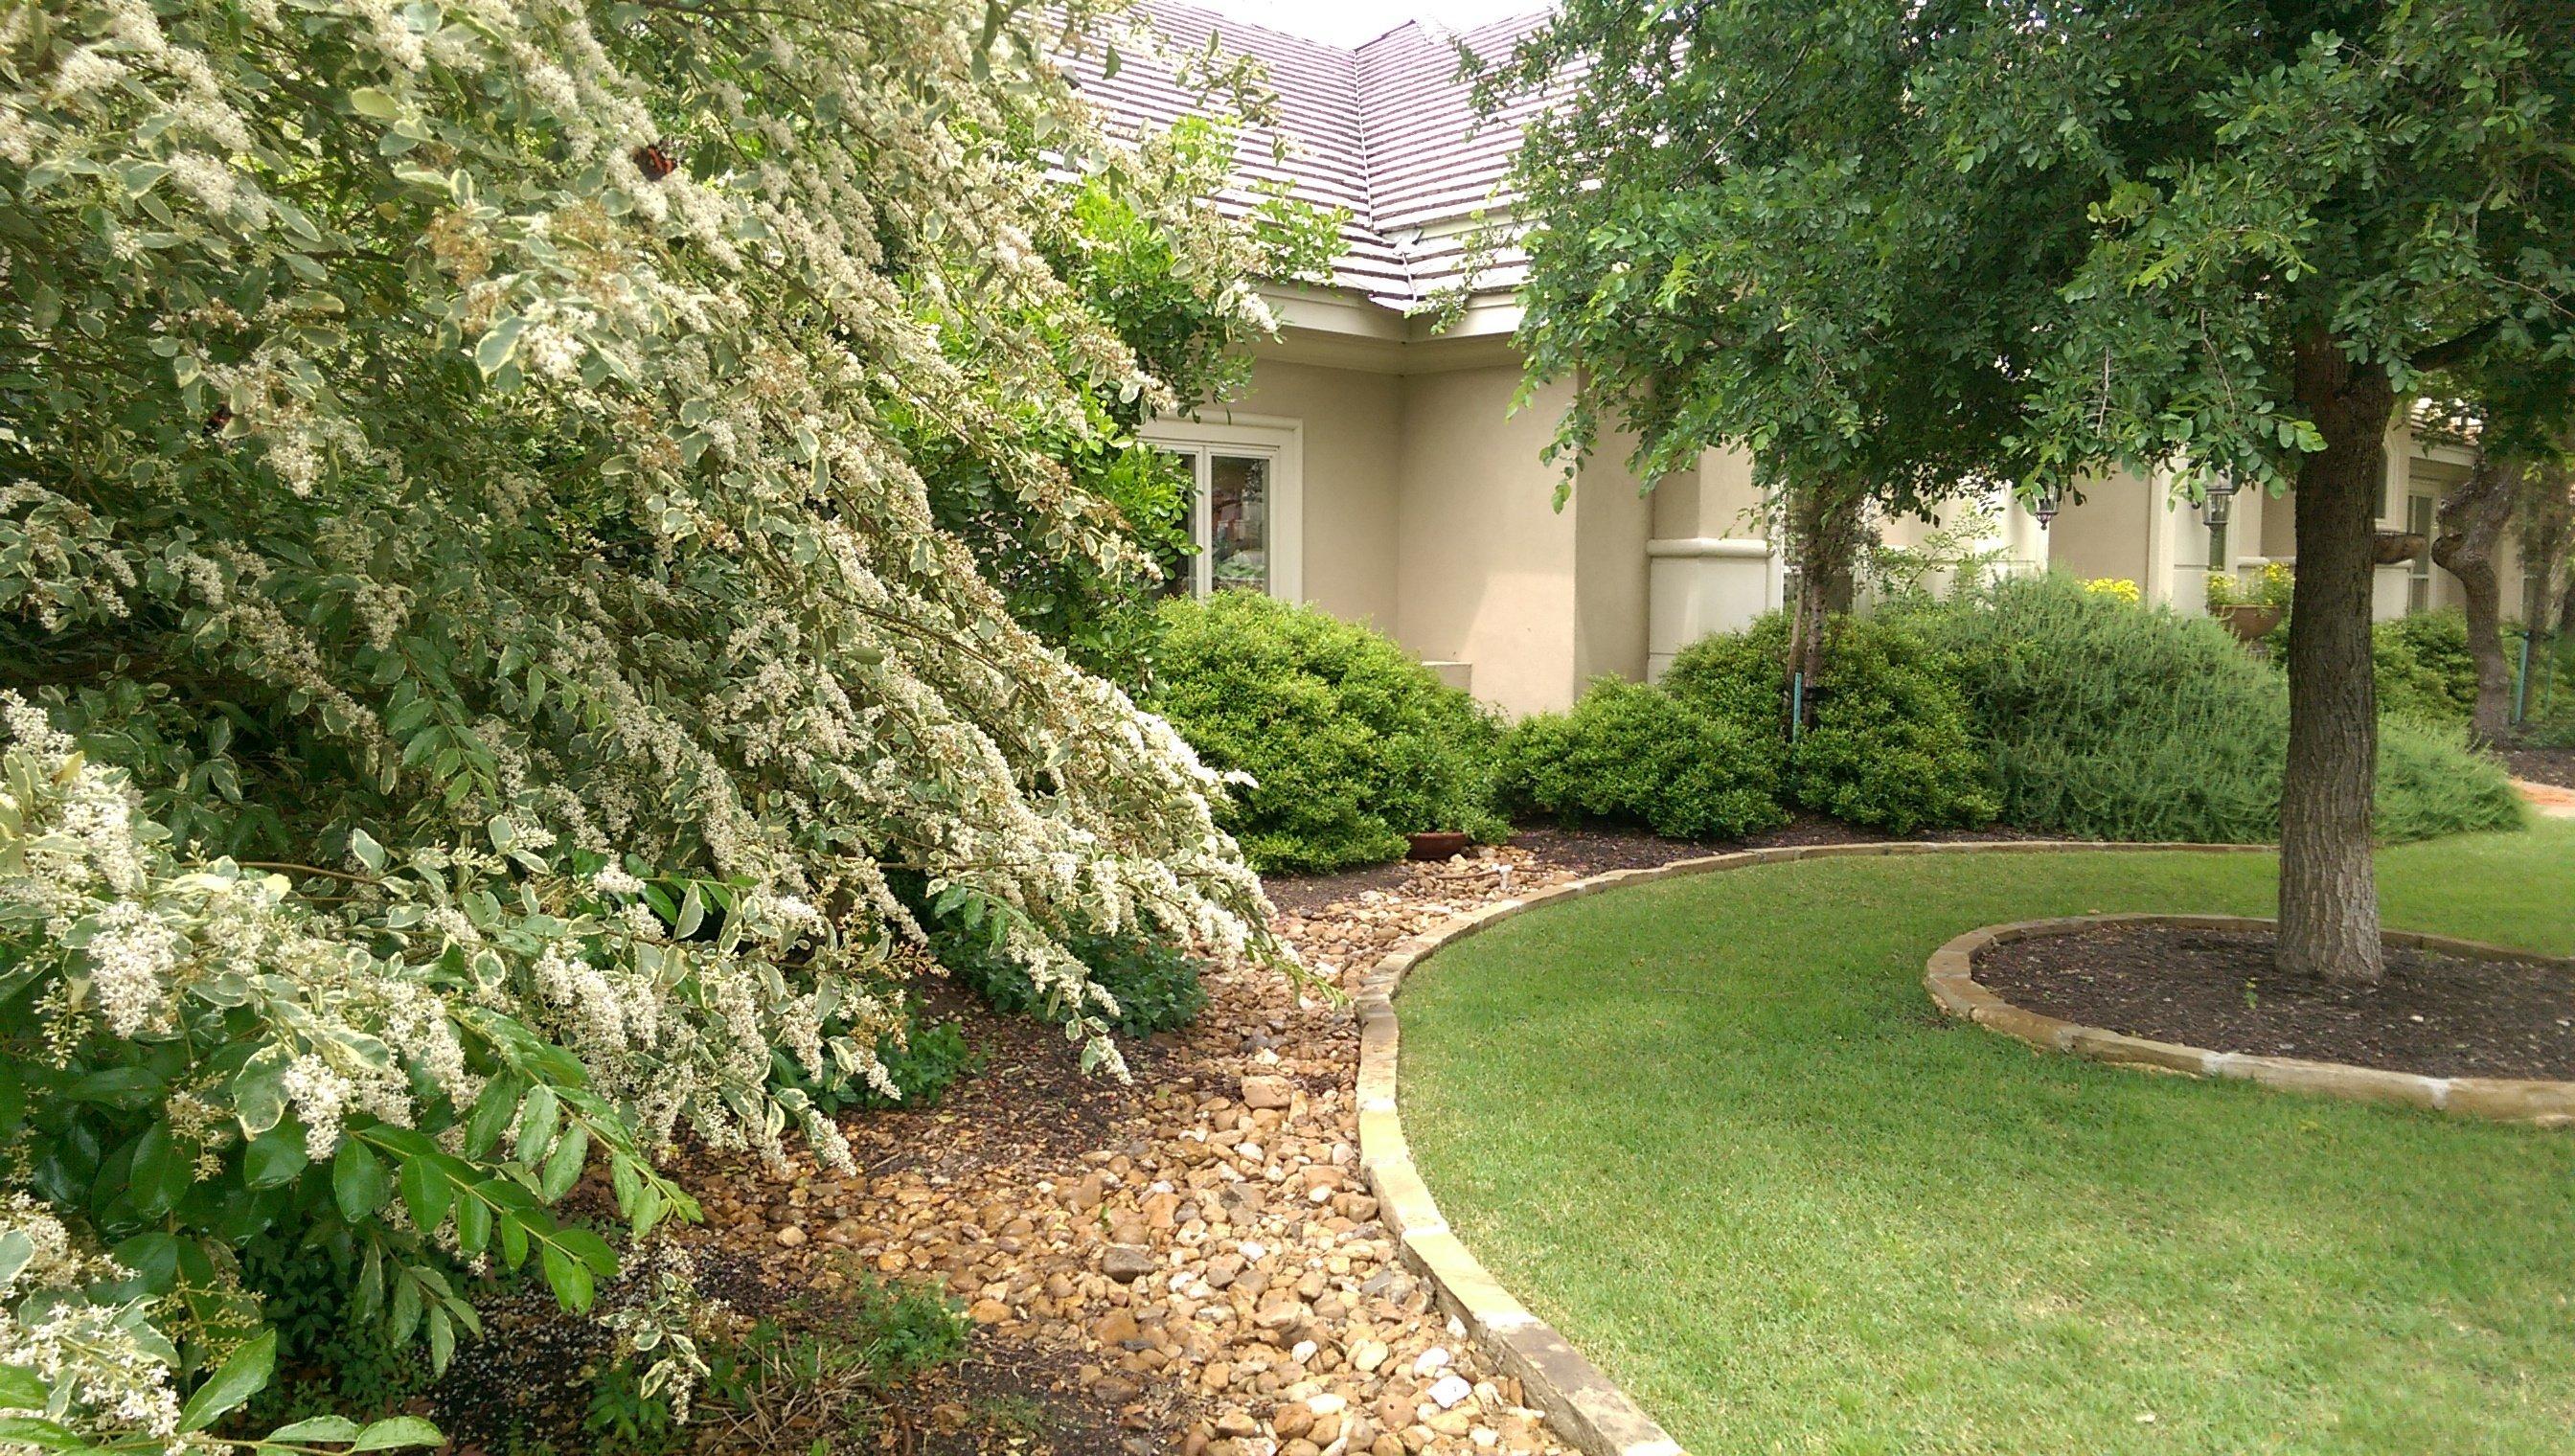 Lawn Maintenance & Organic Lawn Care San Antonio, TX